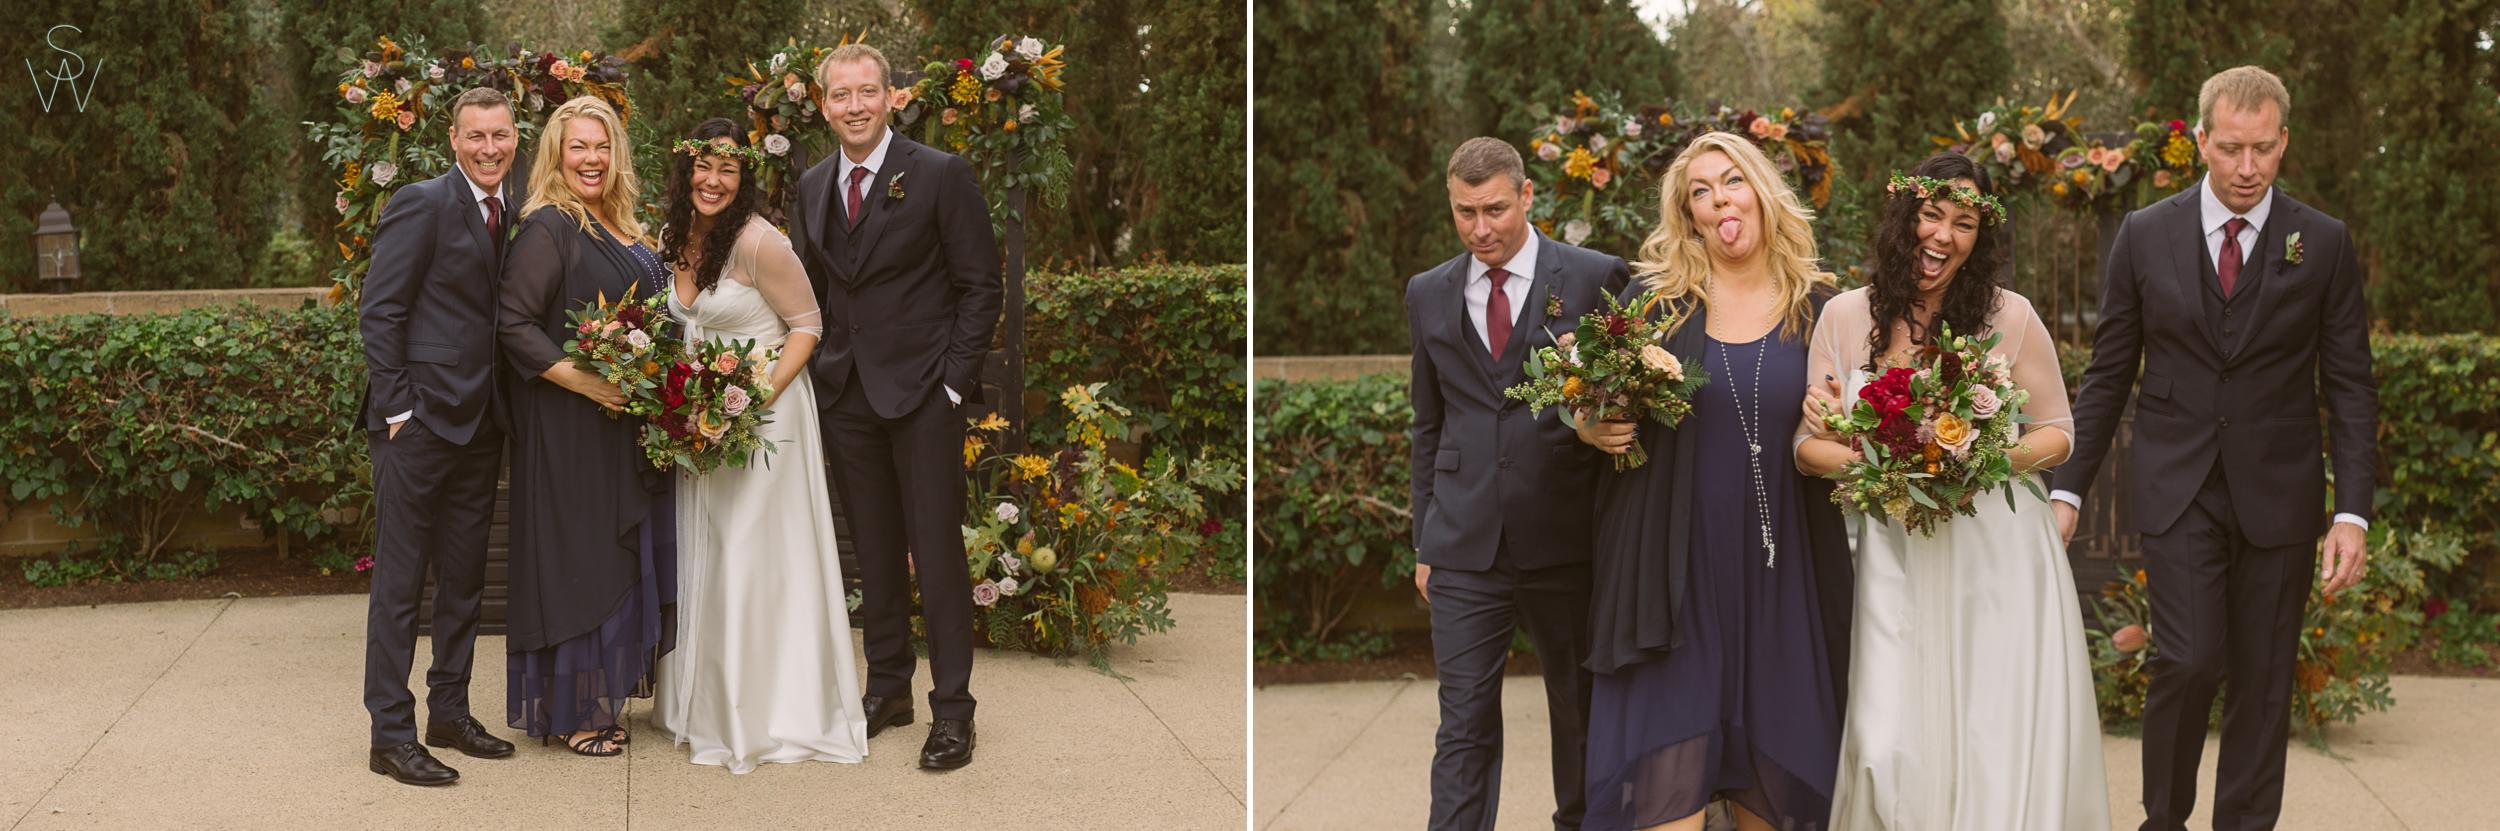 156Estancia.Shewanders.Wedding.Photography.JPG